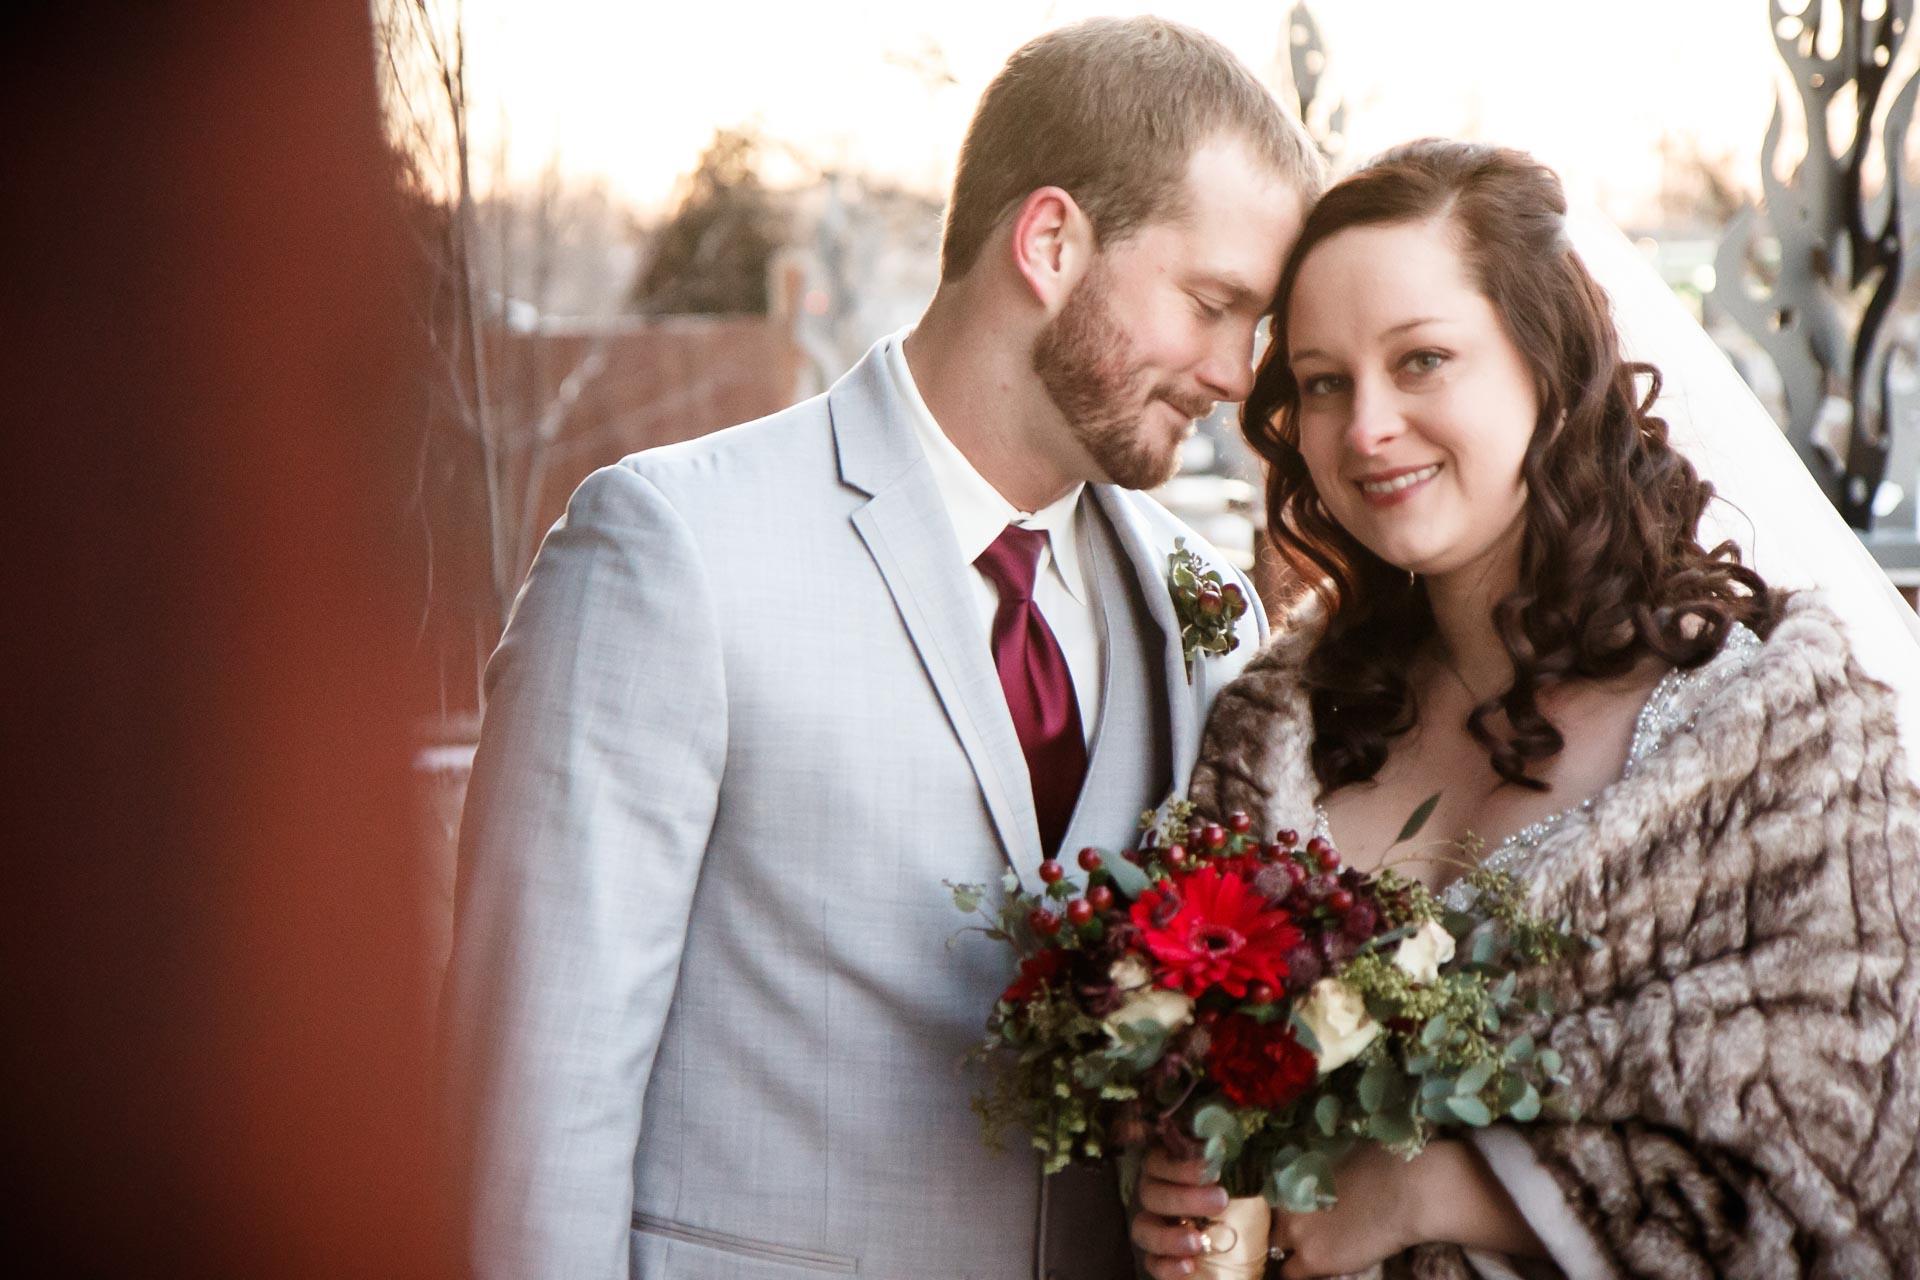 wedding-adam-shea-photography-green-bay-appleton-neenah-photographer-20.jpg